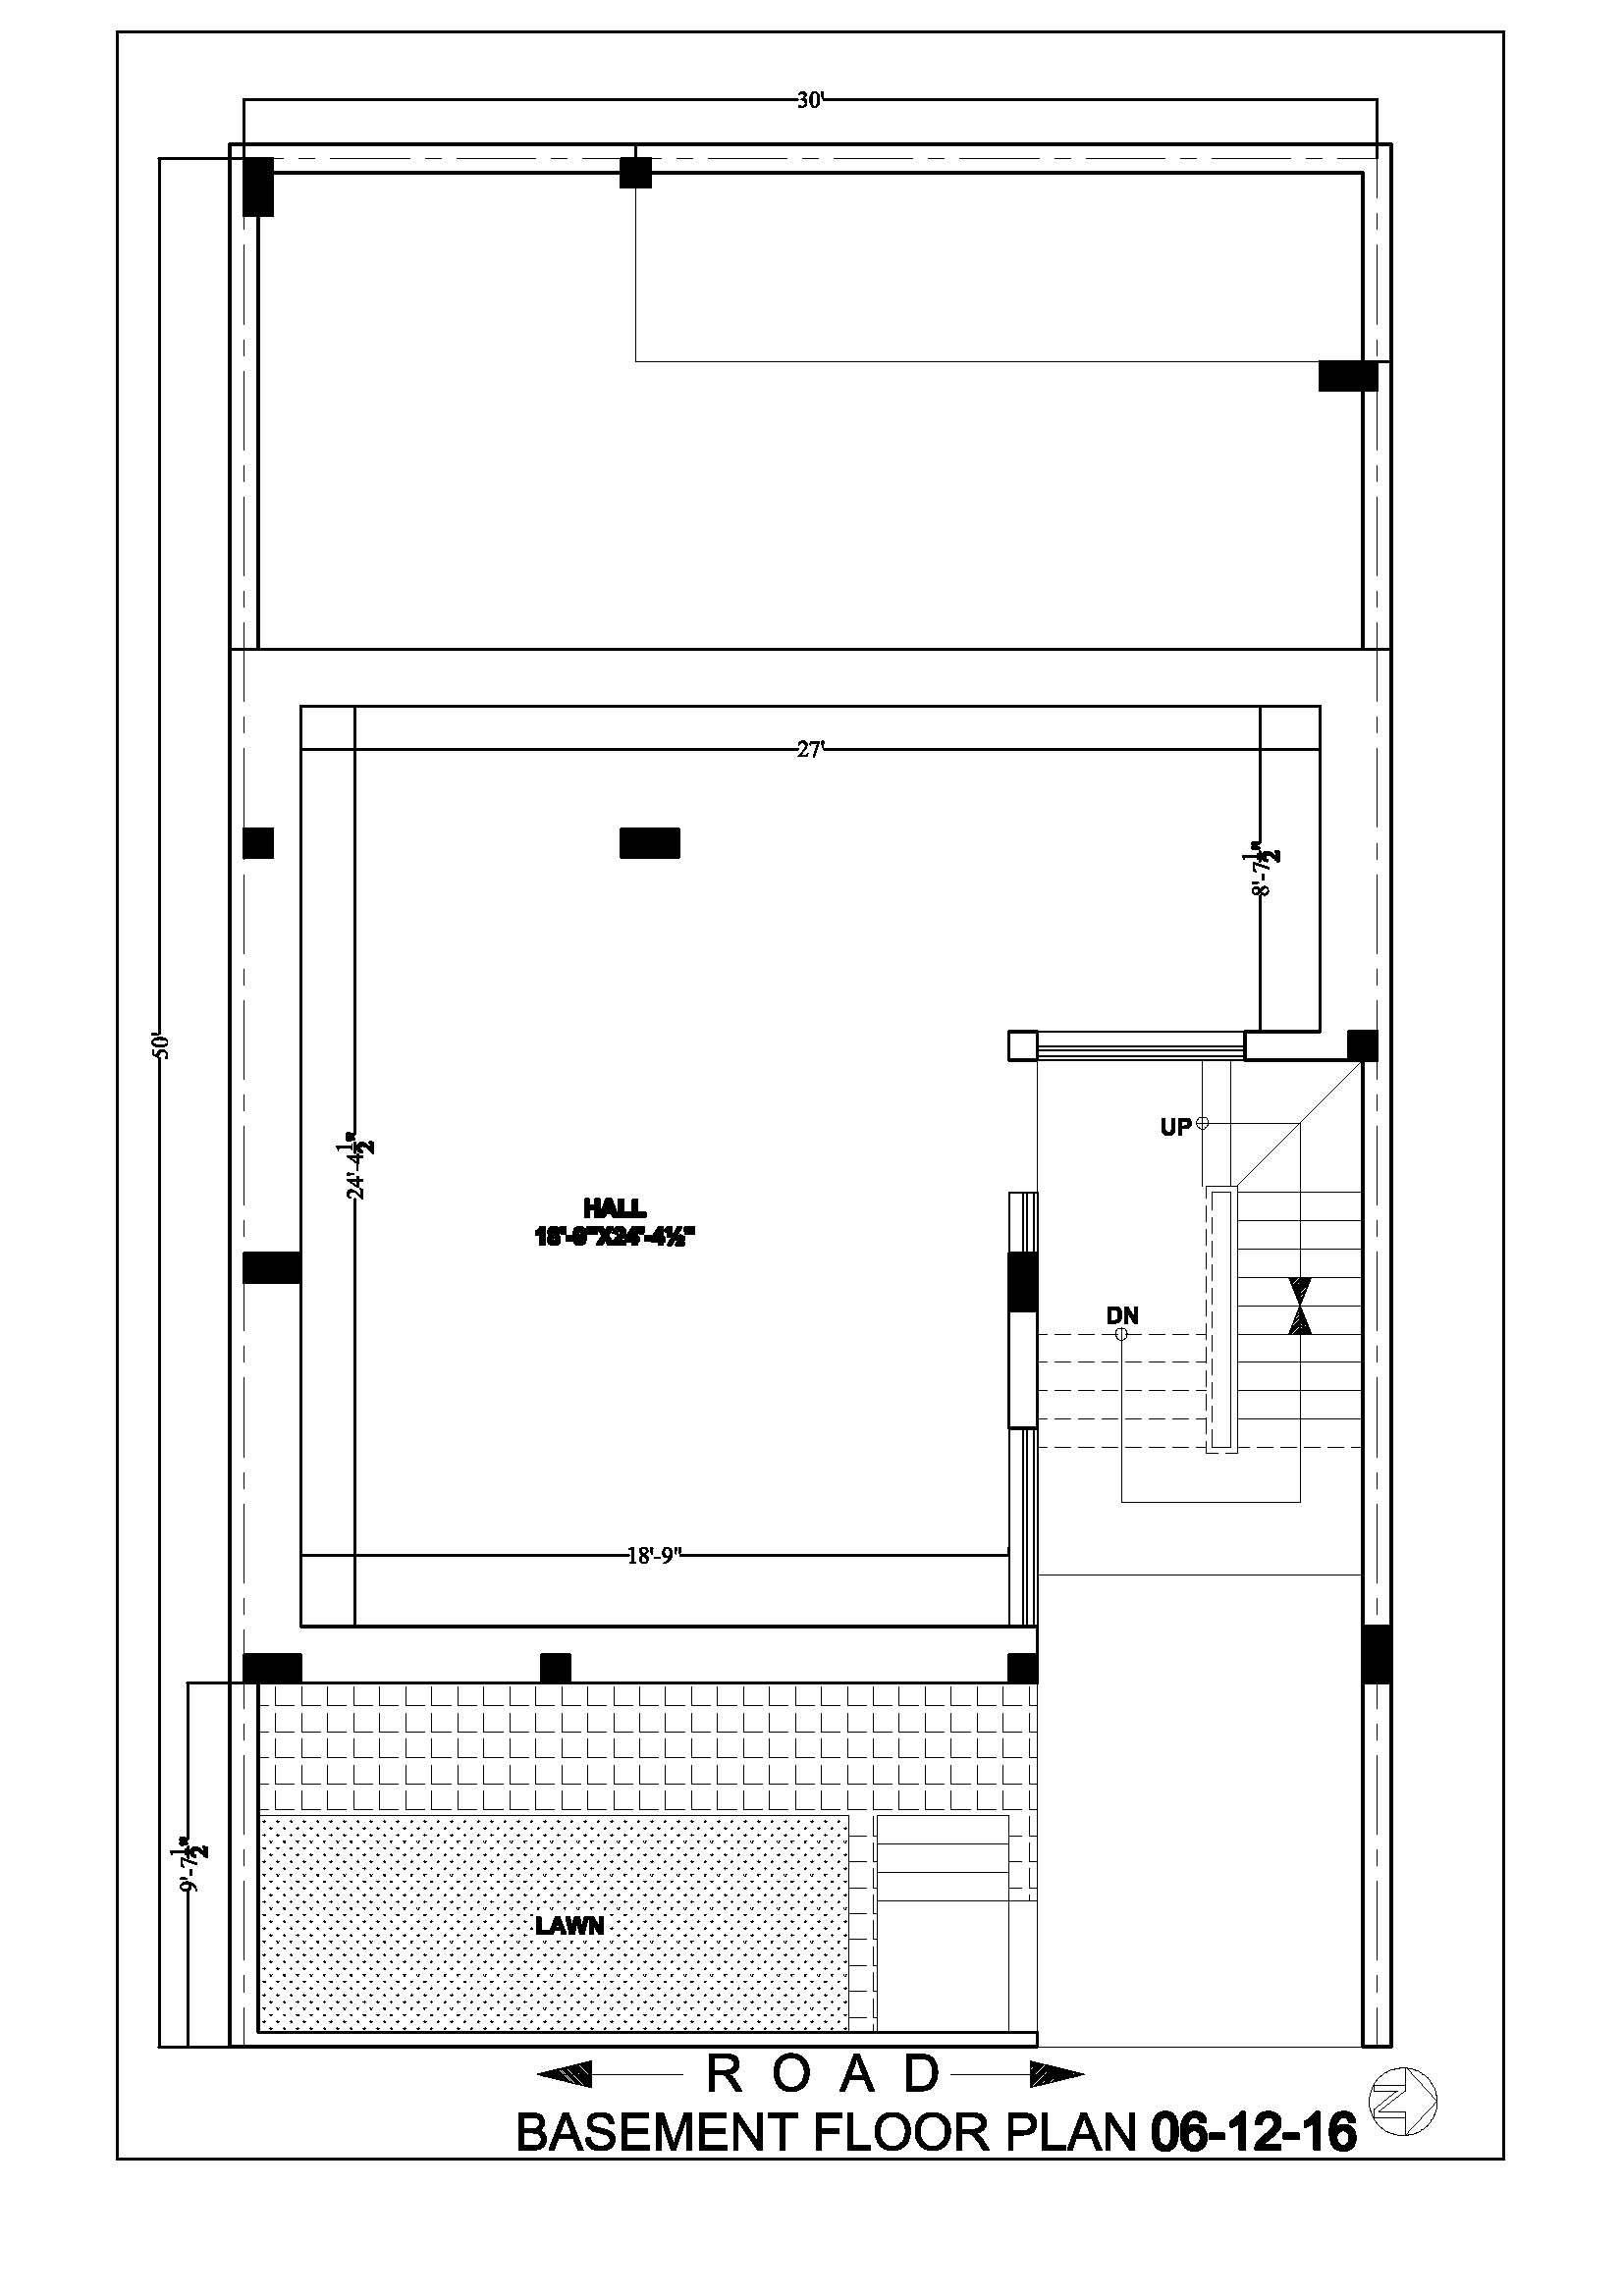 30 50 Basement Plan House Map Basement House Plans House Plans